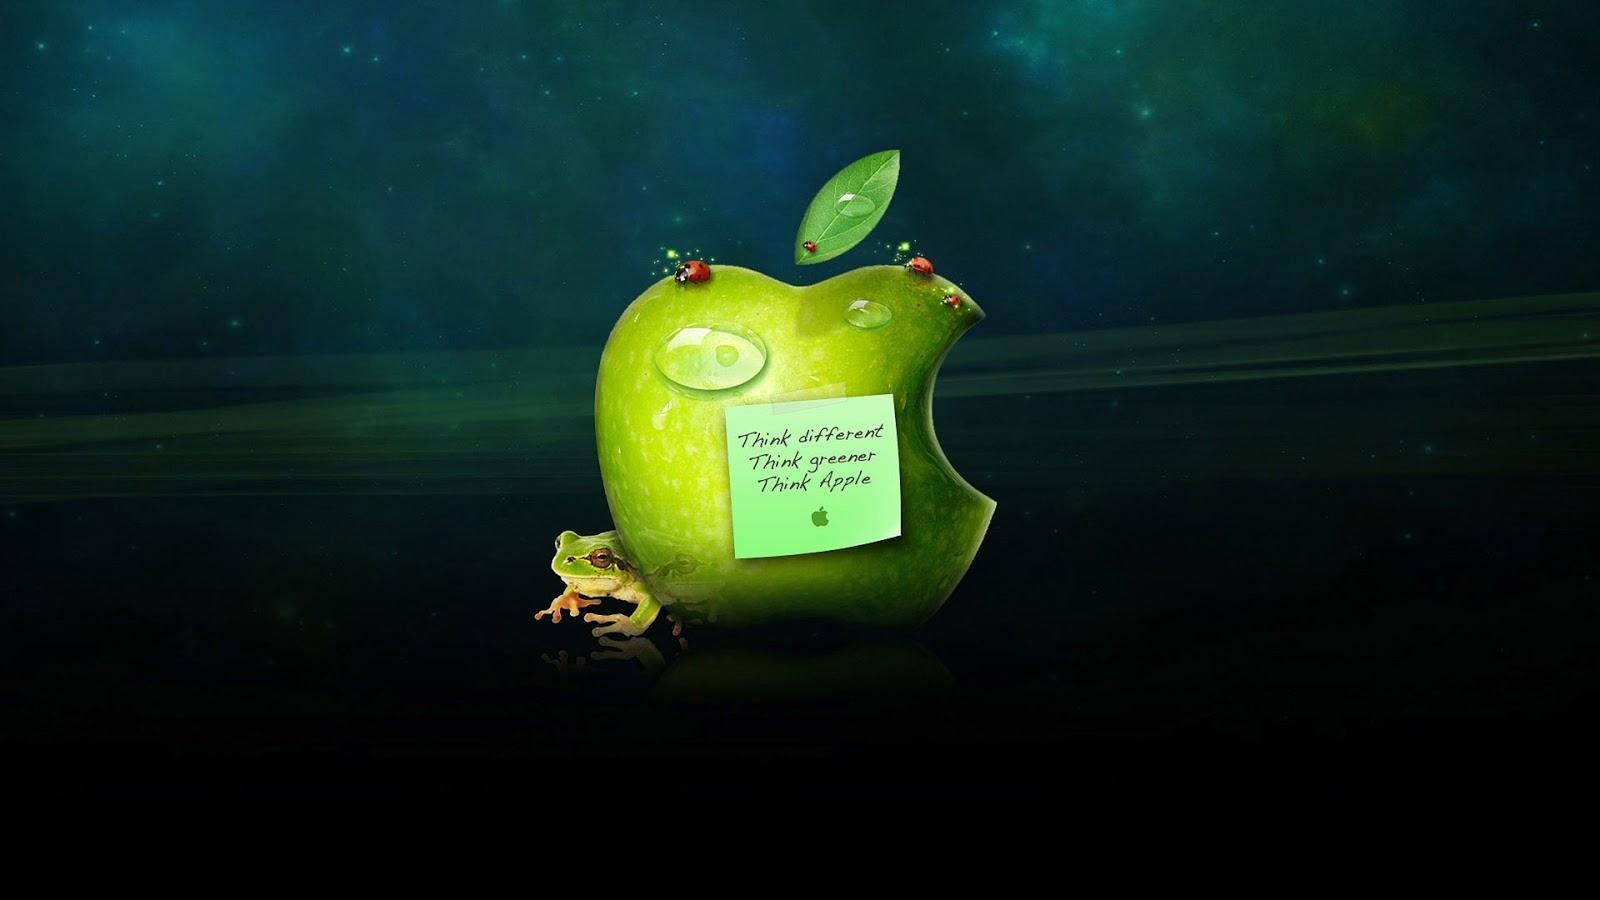 Apple Think Green